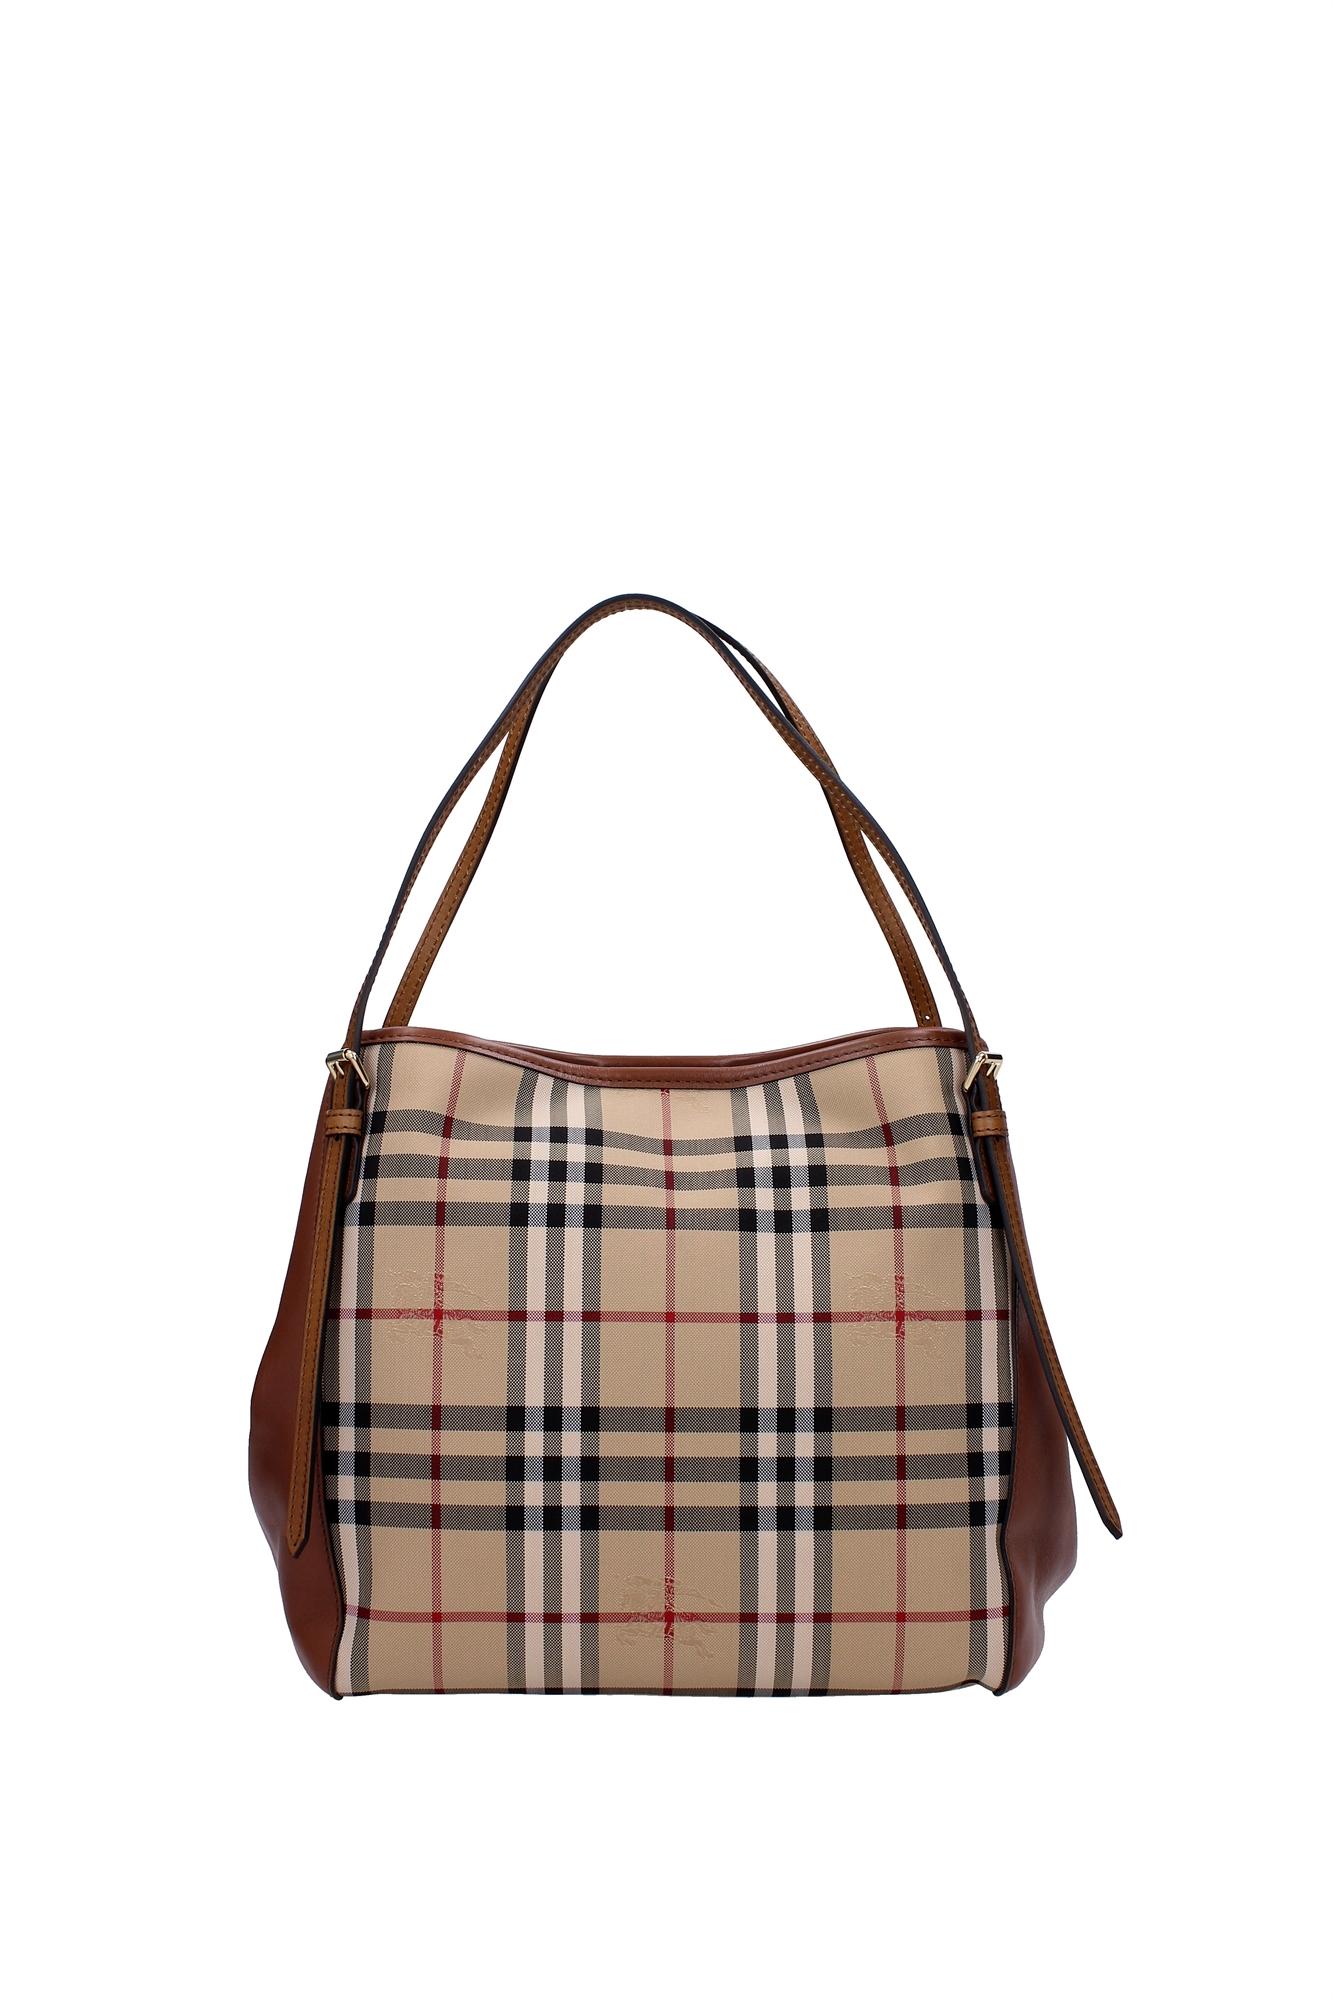 Wonderful   Shoes Amp Accessories Gt Women39s Handbags Amp Bags Gt Handb